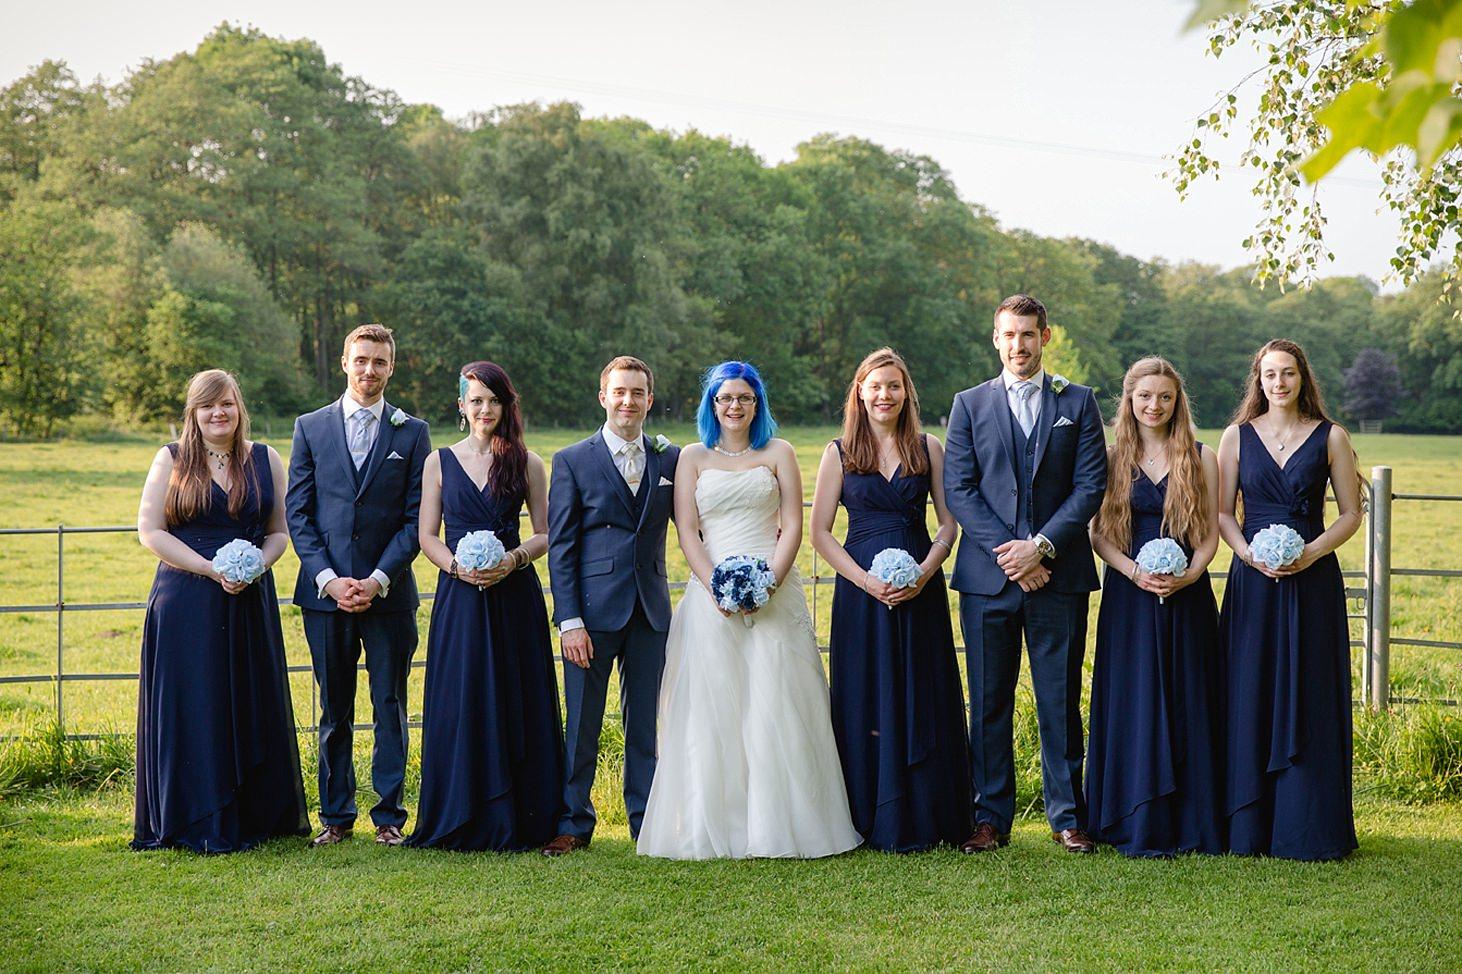 gate street barn wedding photography bridal party portrait